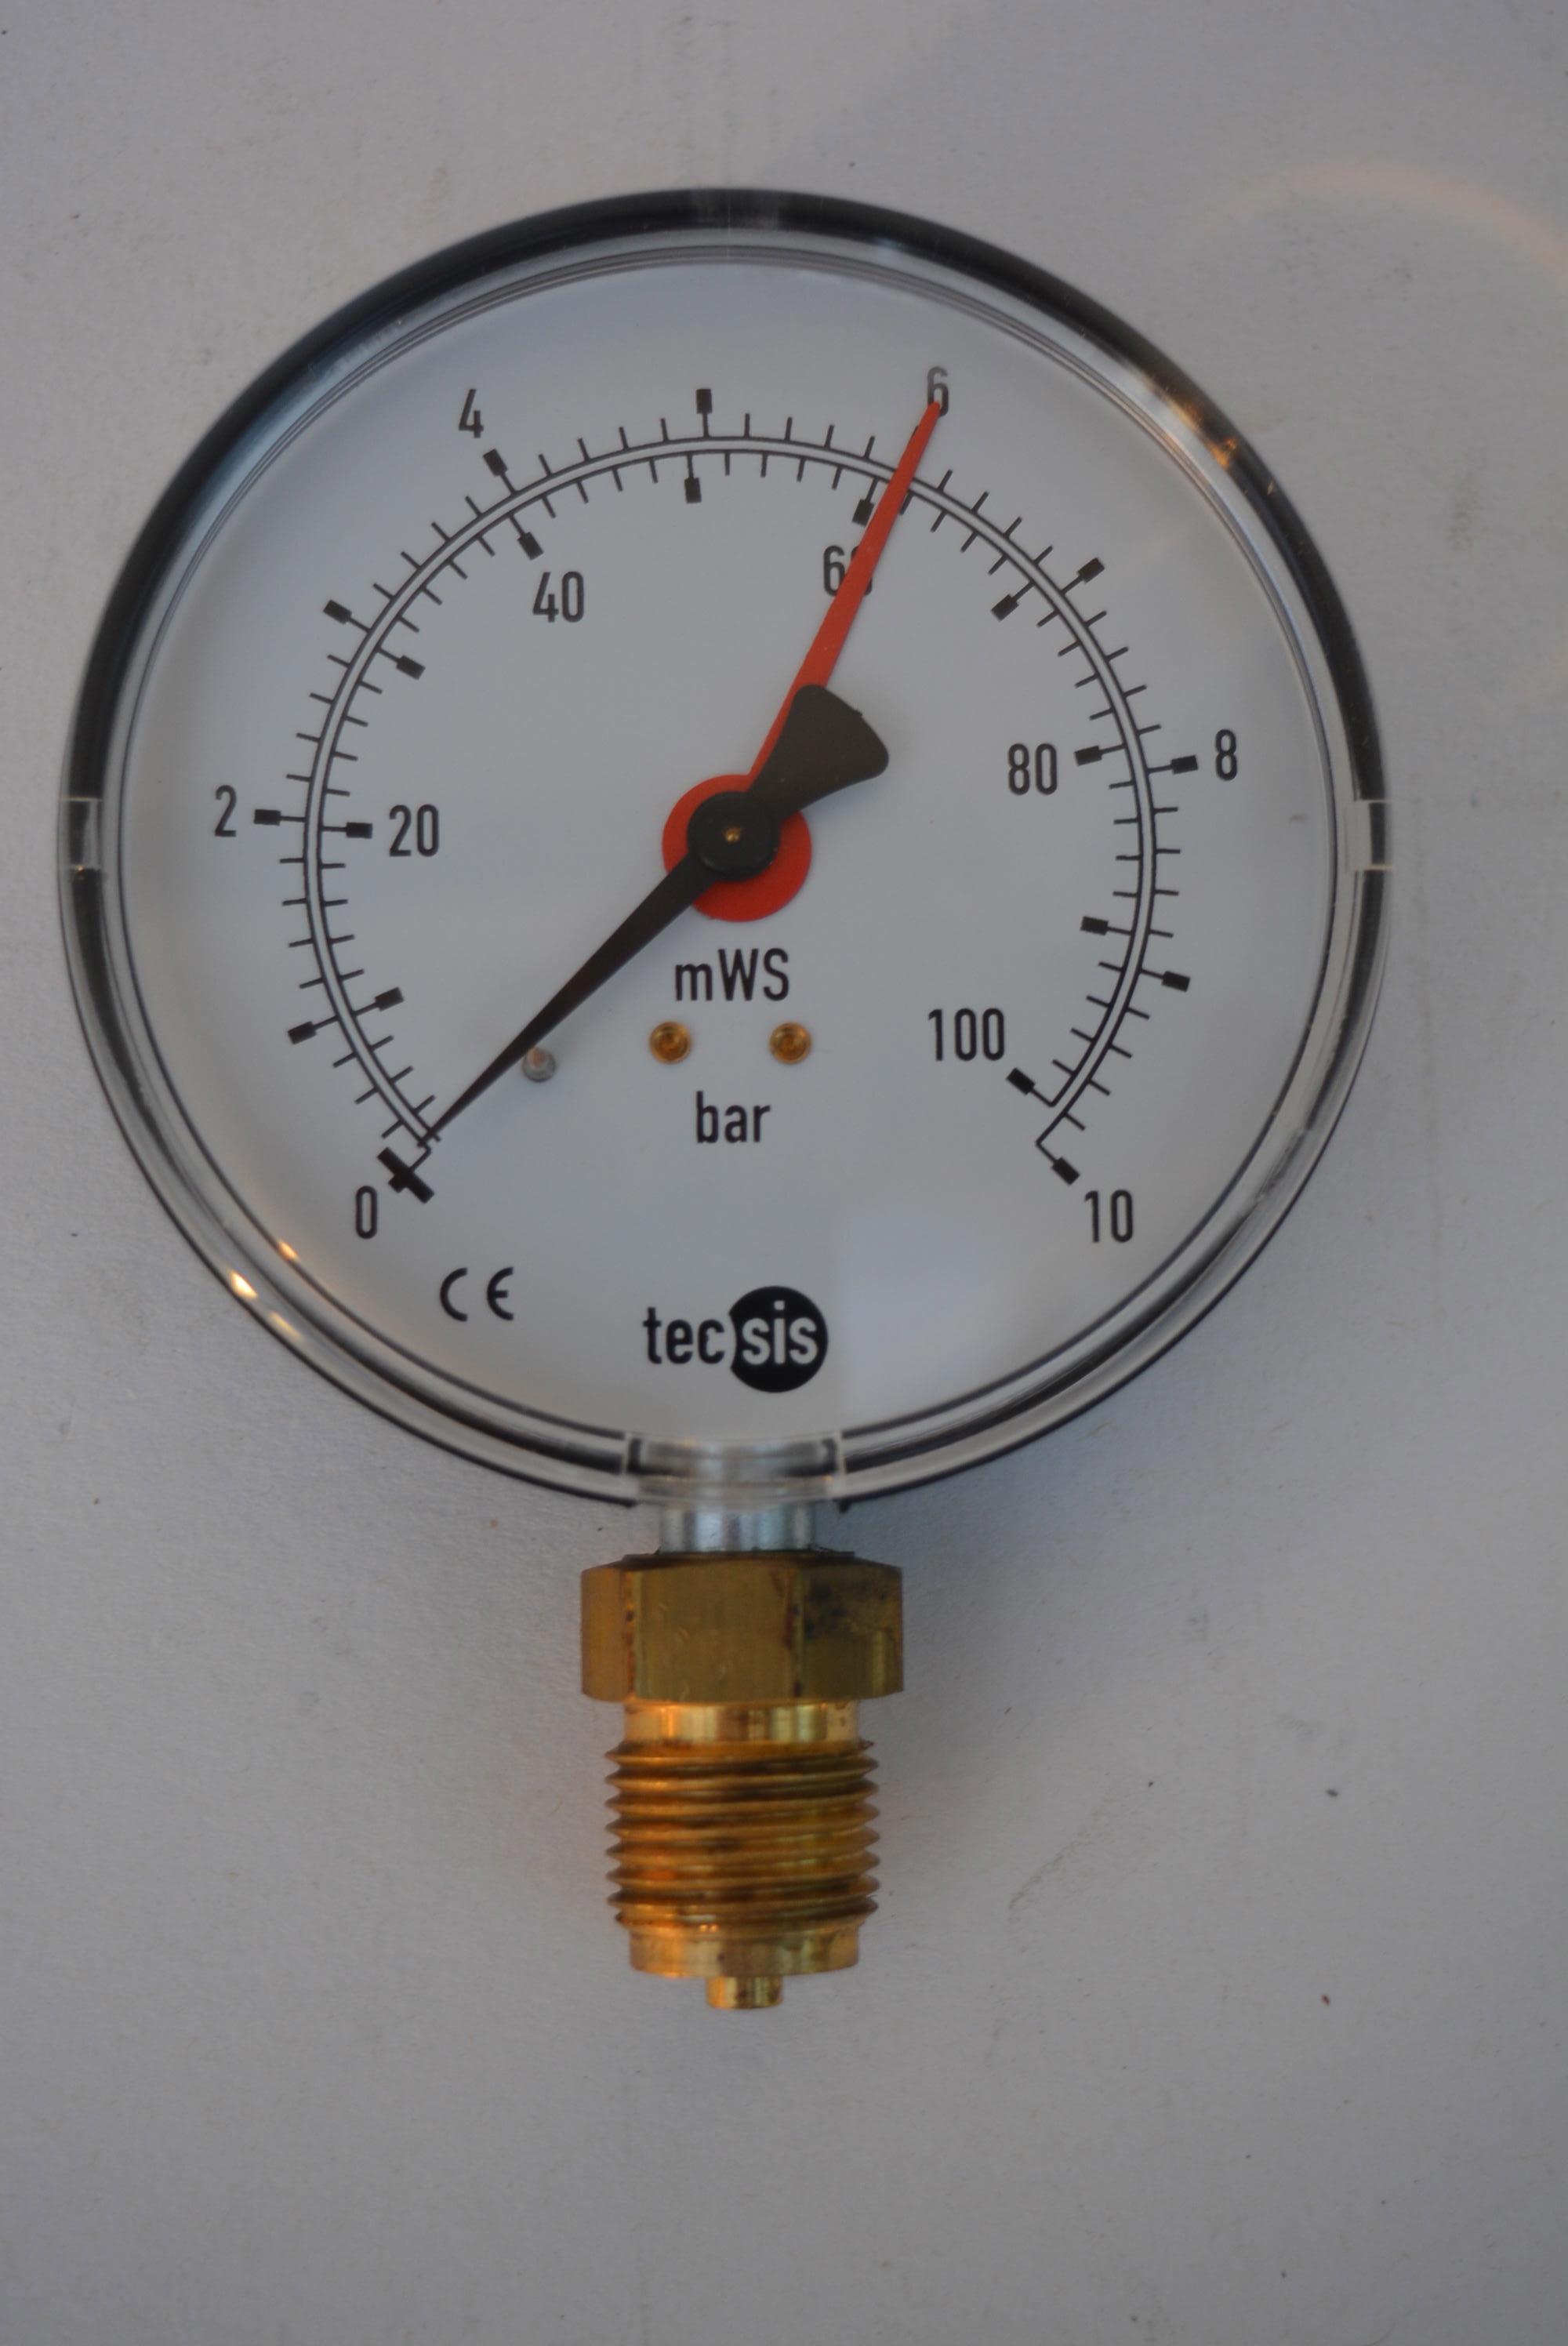 manometer druckmanometer 10 bar durchmesser 10 cm tecsis 1 2 typ ng dia ebay. Black Bedroom Furniture Sets. Home Design Ideas